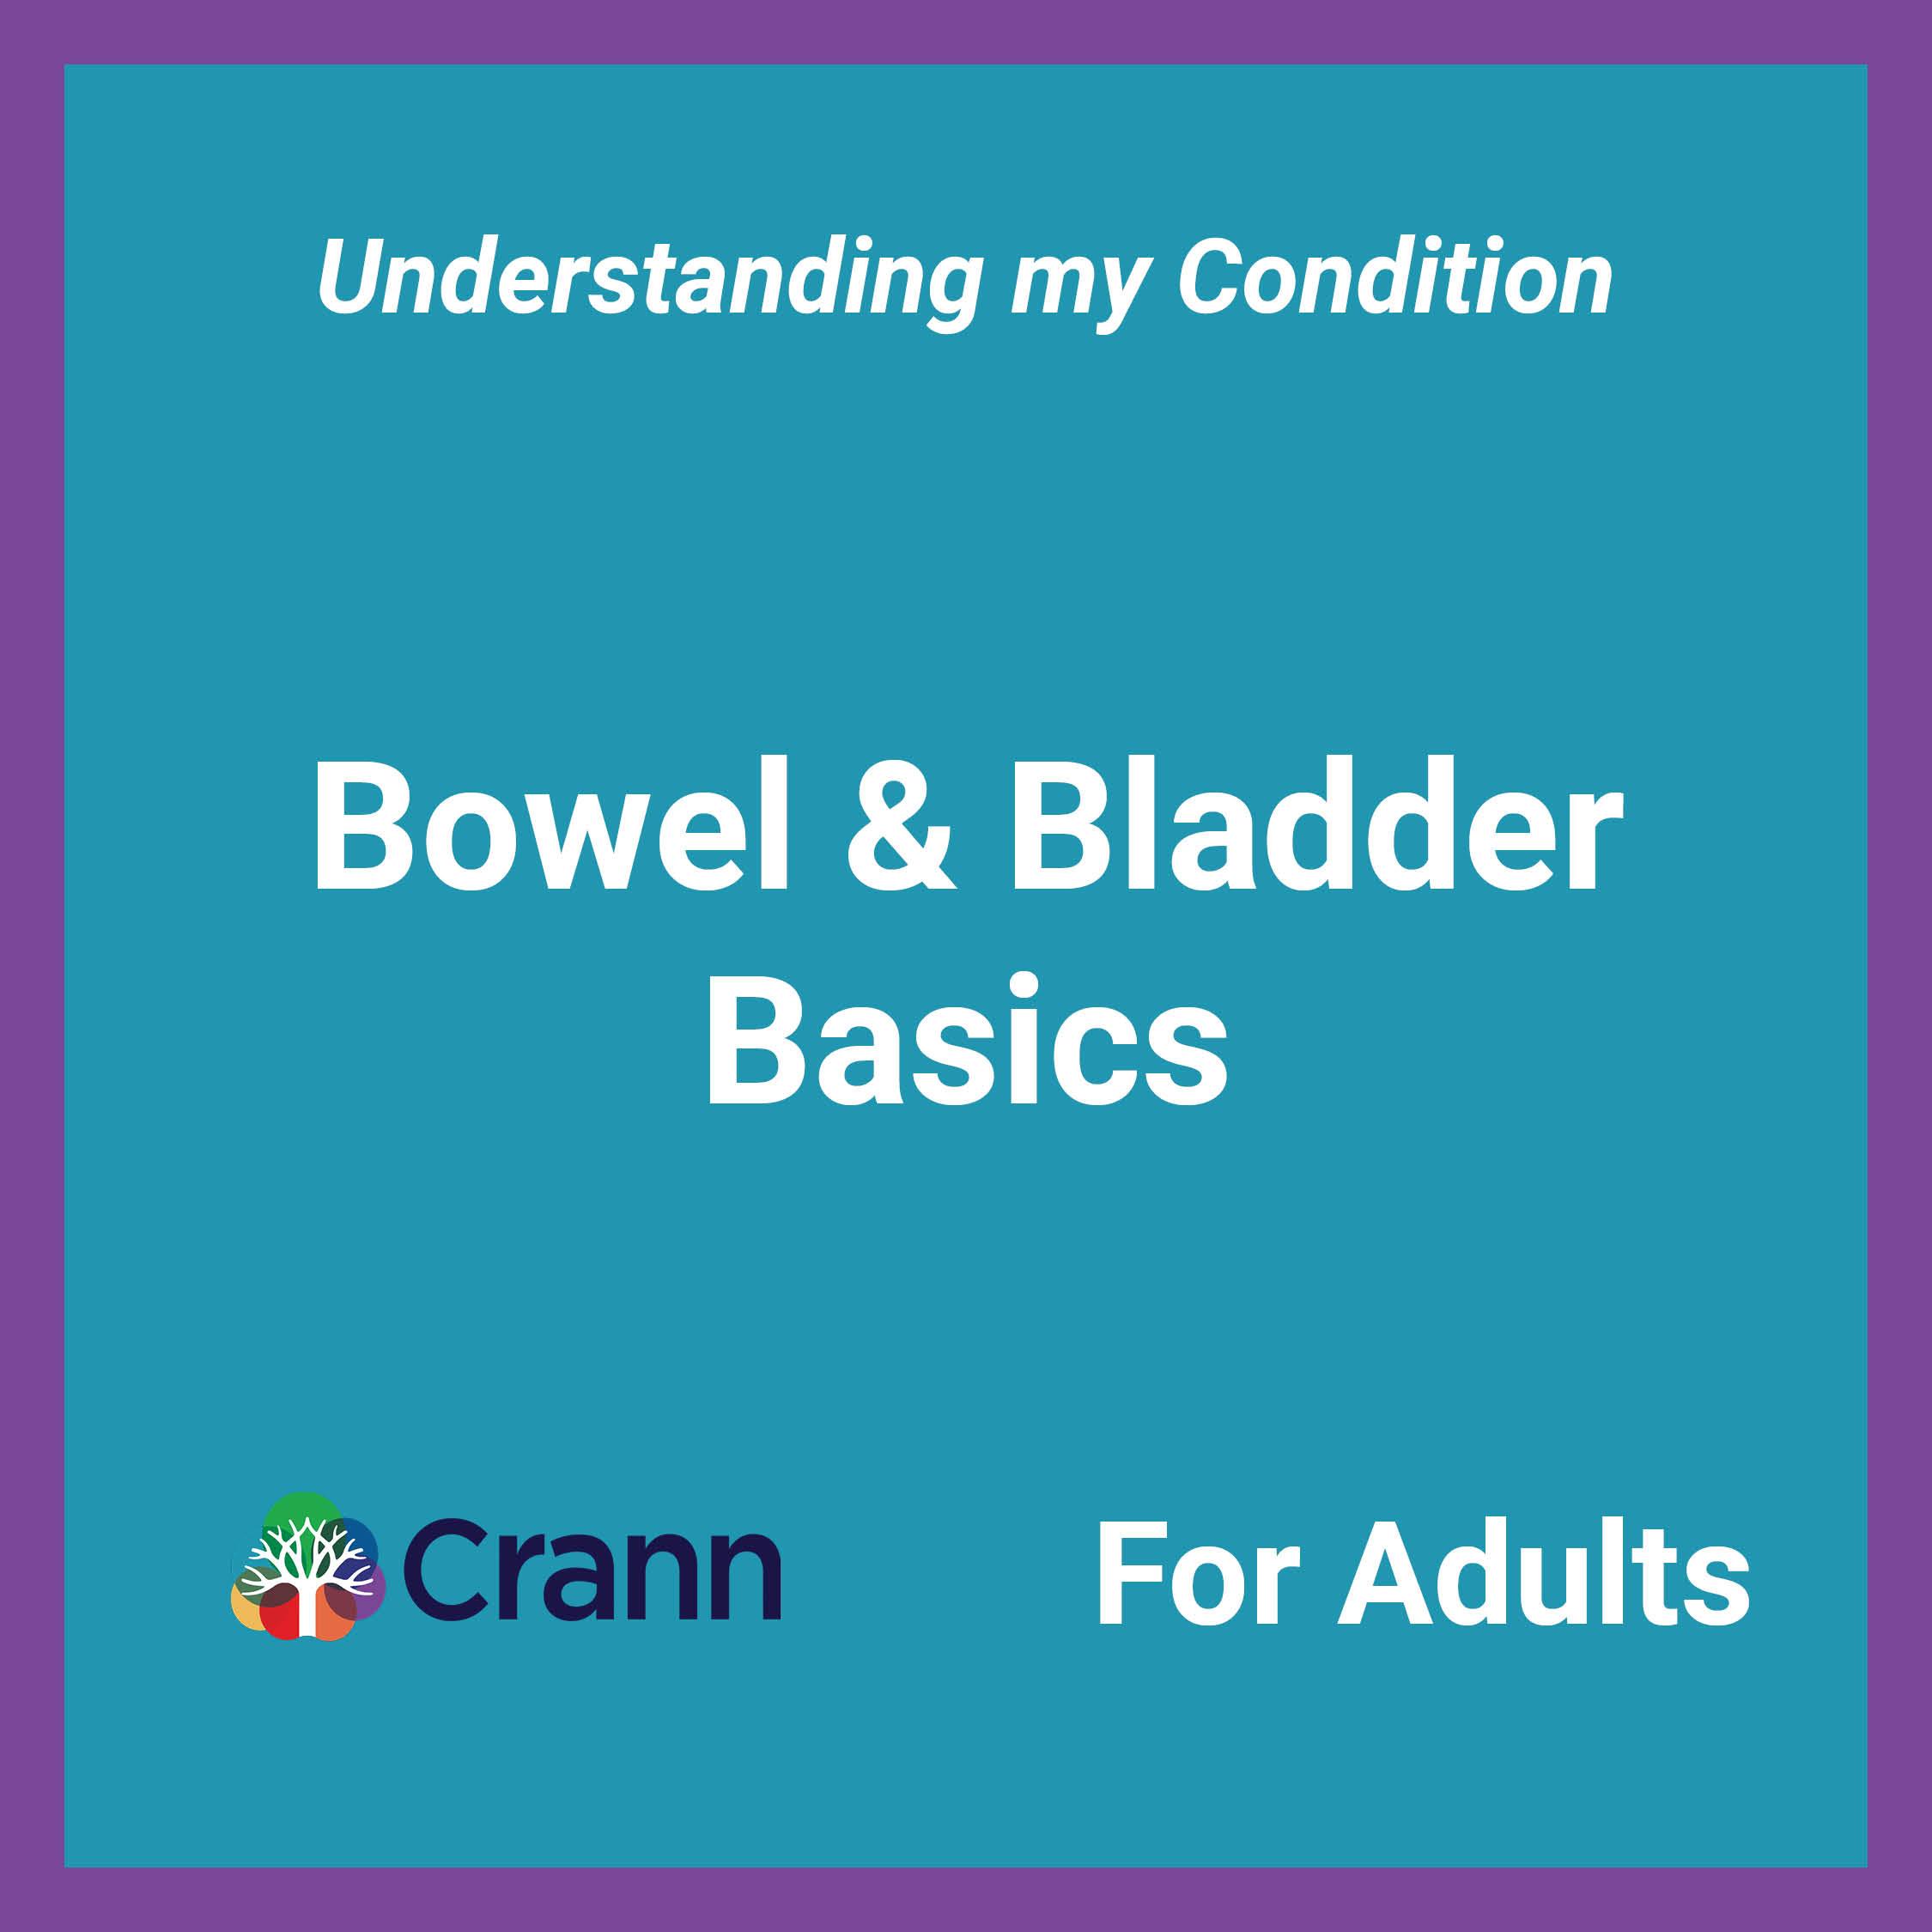 Bowel and Bladder Basics banner image - text overlayed on blue background